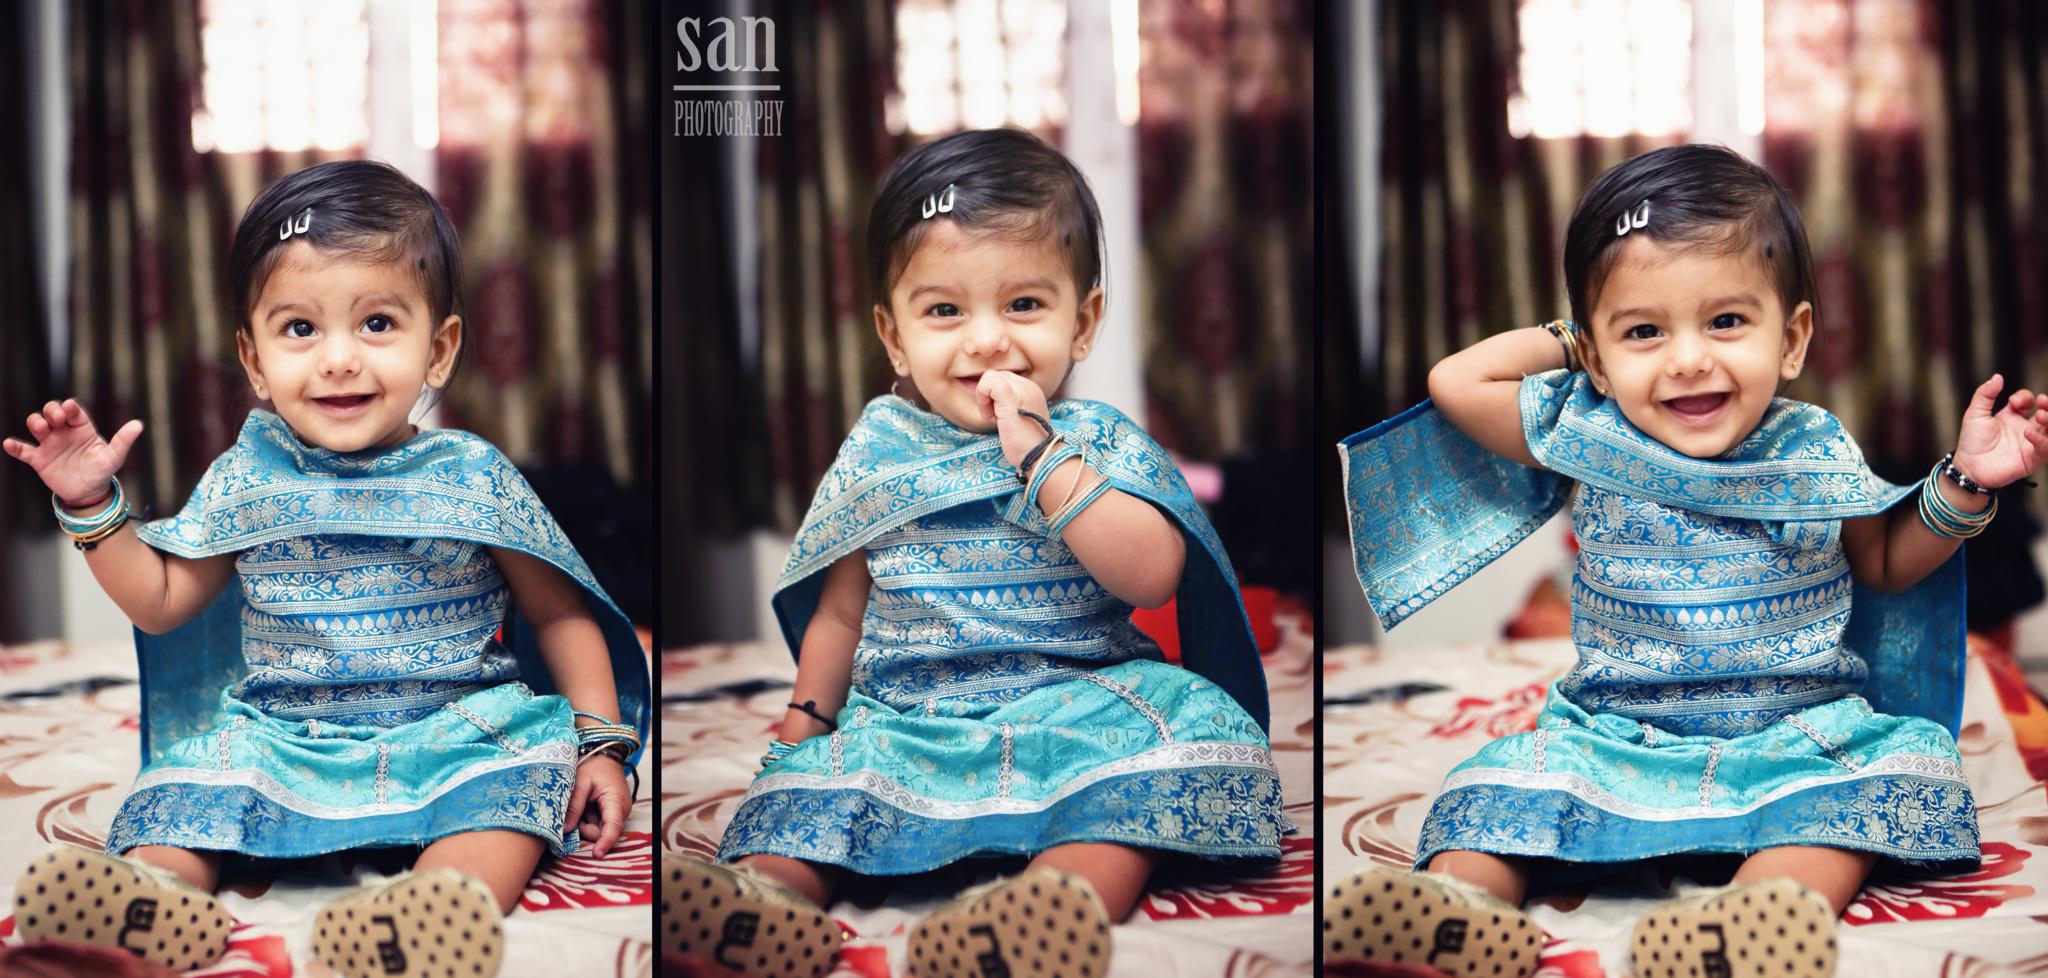 Latika + Gautam - 09.jpg